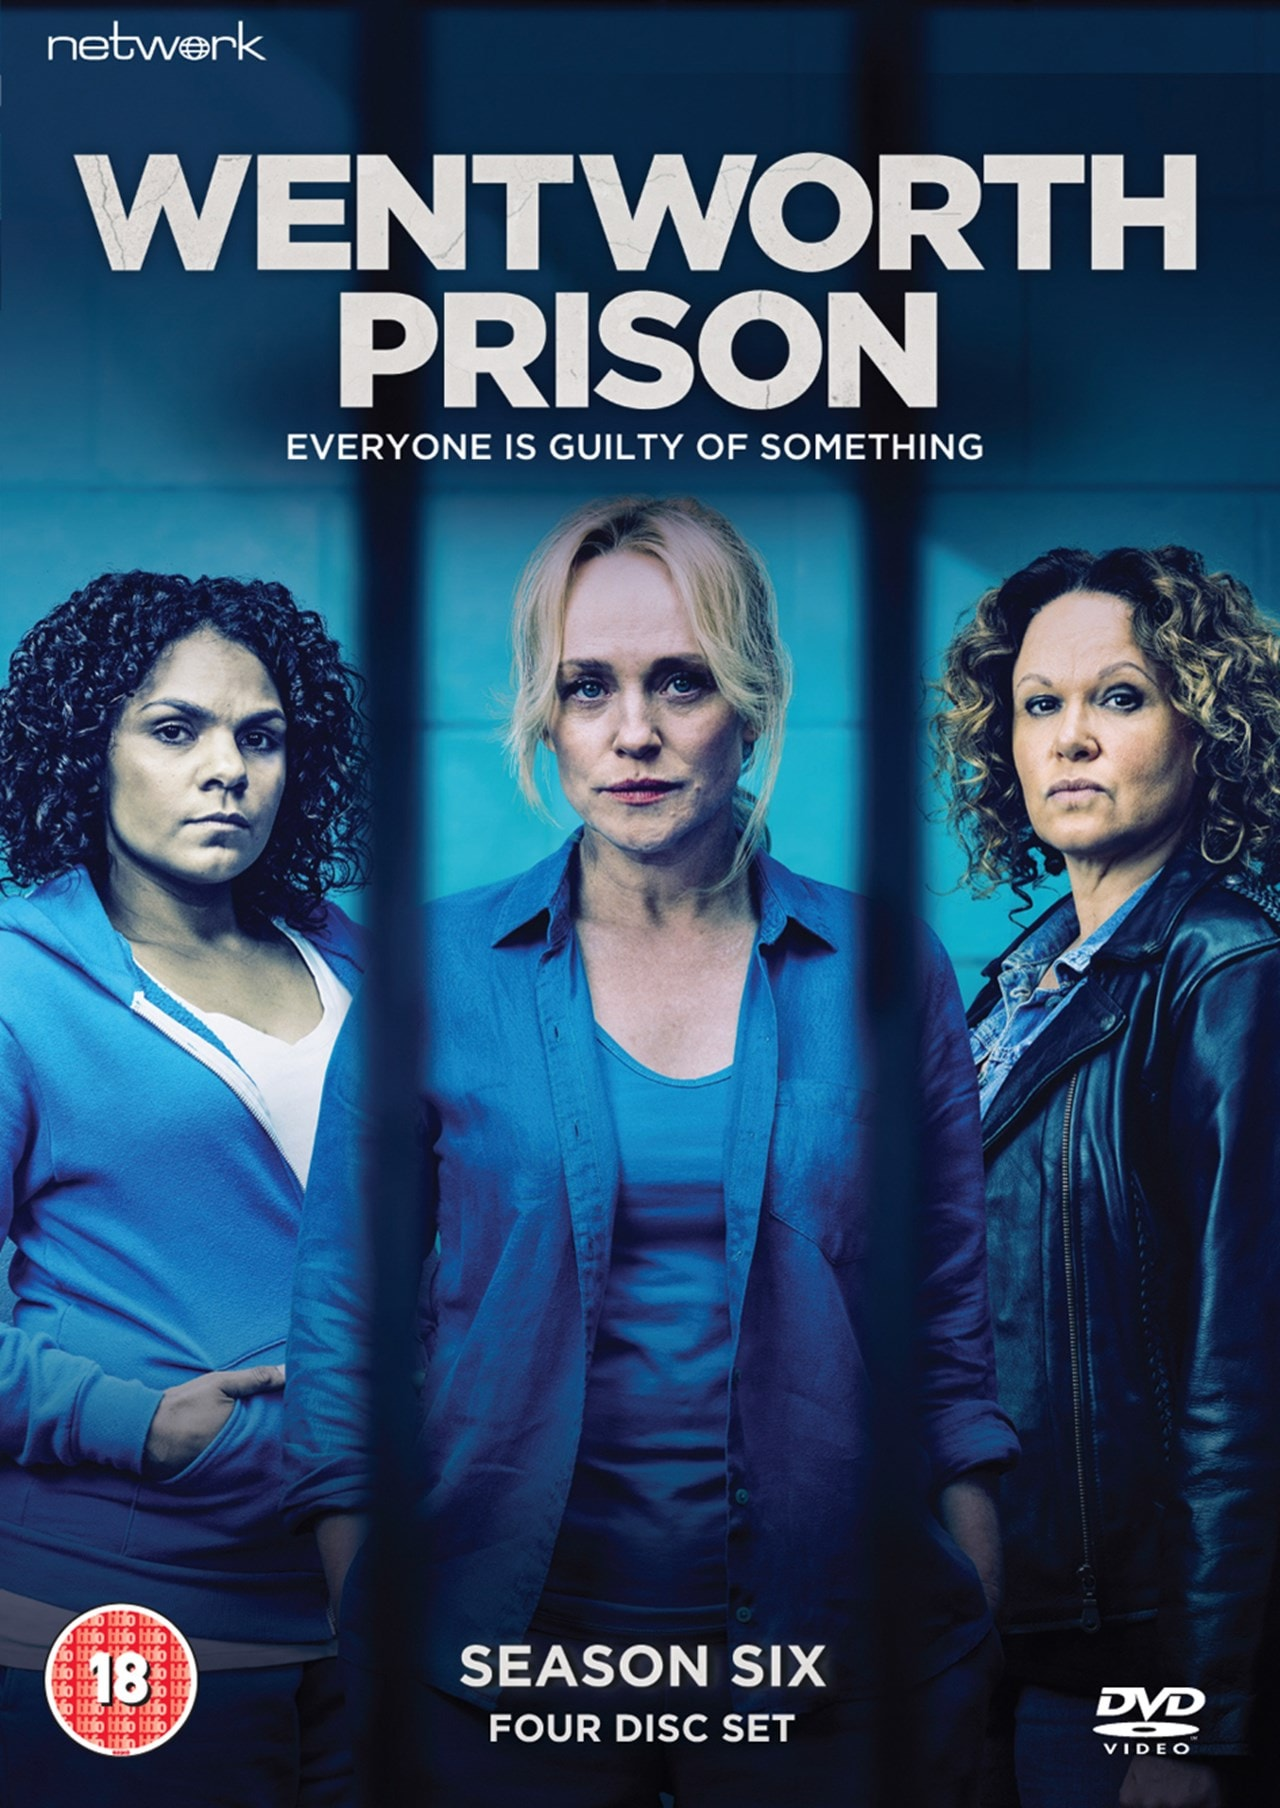 Wentworth Prison: Season Six - 1